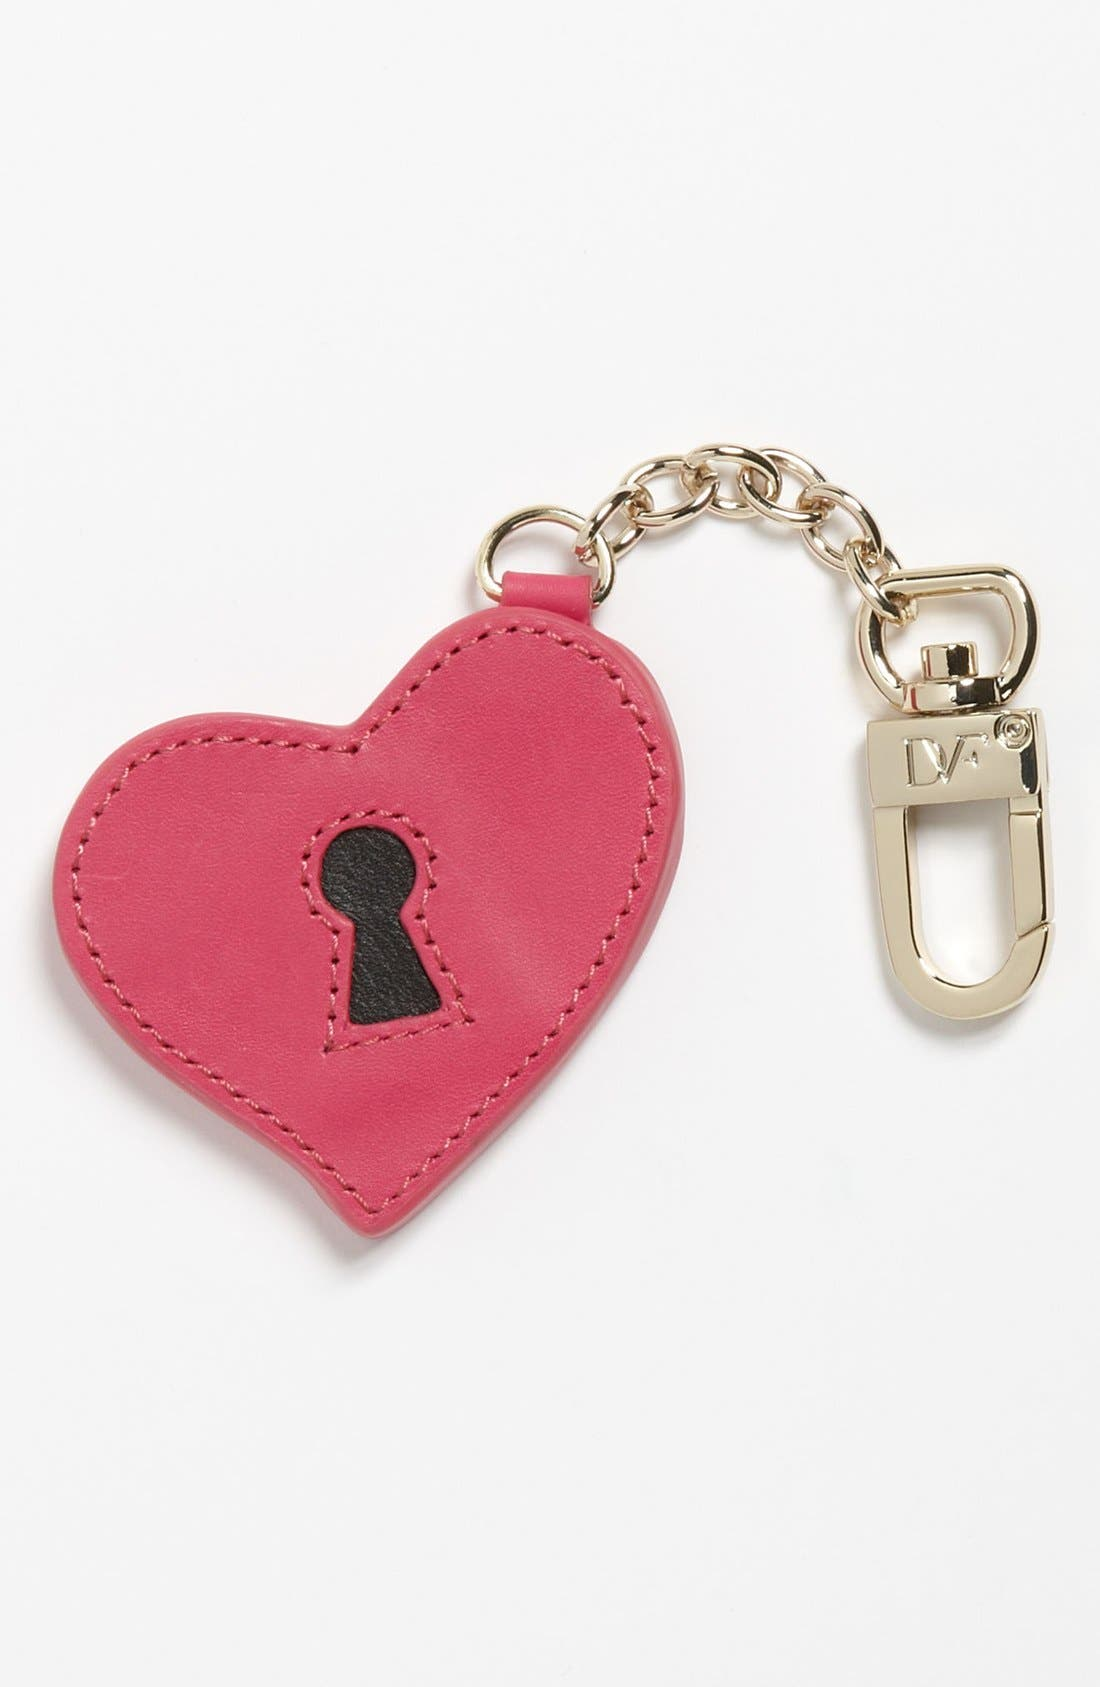 Alternate Image 1 Selected - Diane von Furstenberg 'Heart' Key Ring